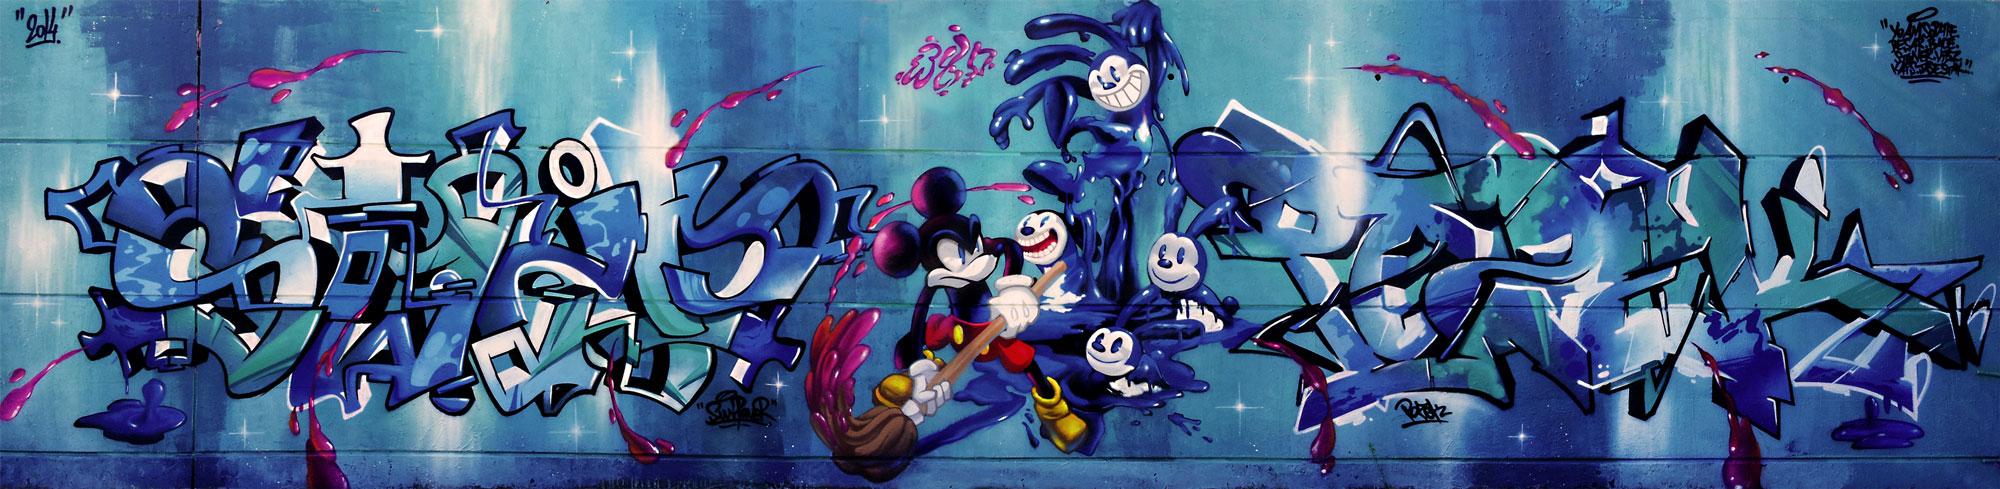 Freque-mickey-Toulouse-swip-pozek-deco-decoration-graff-graffiti